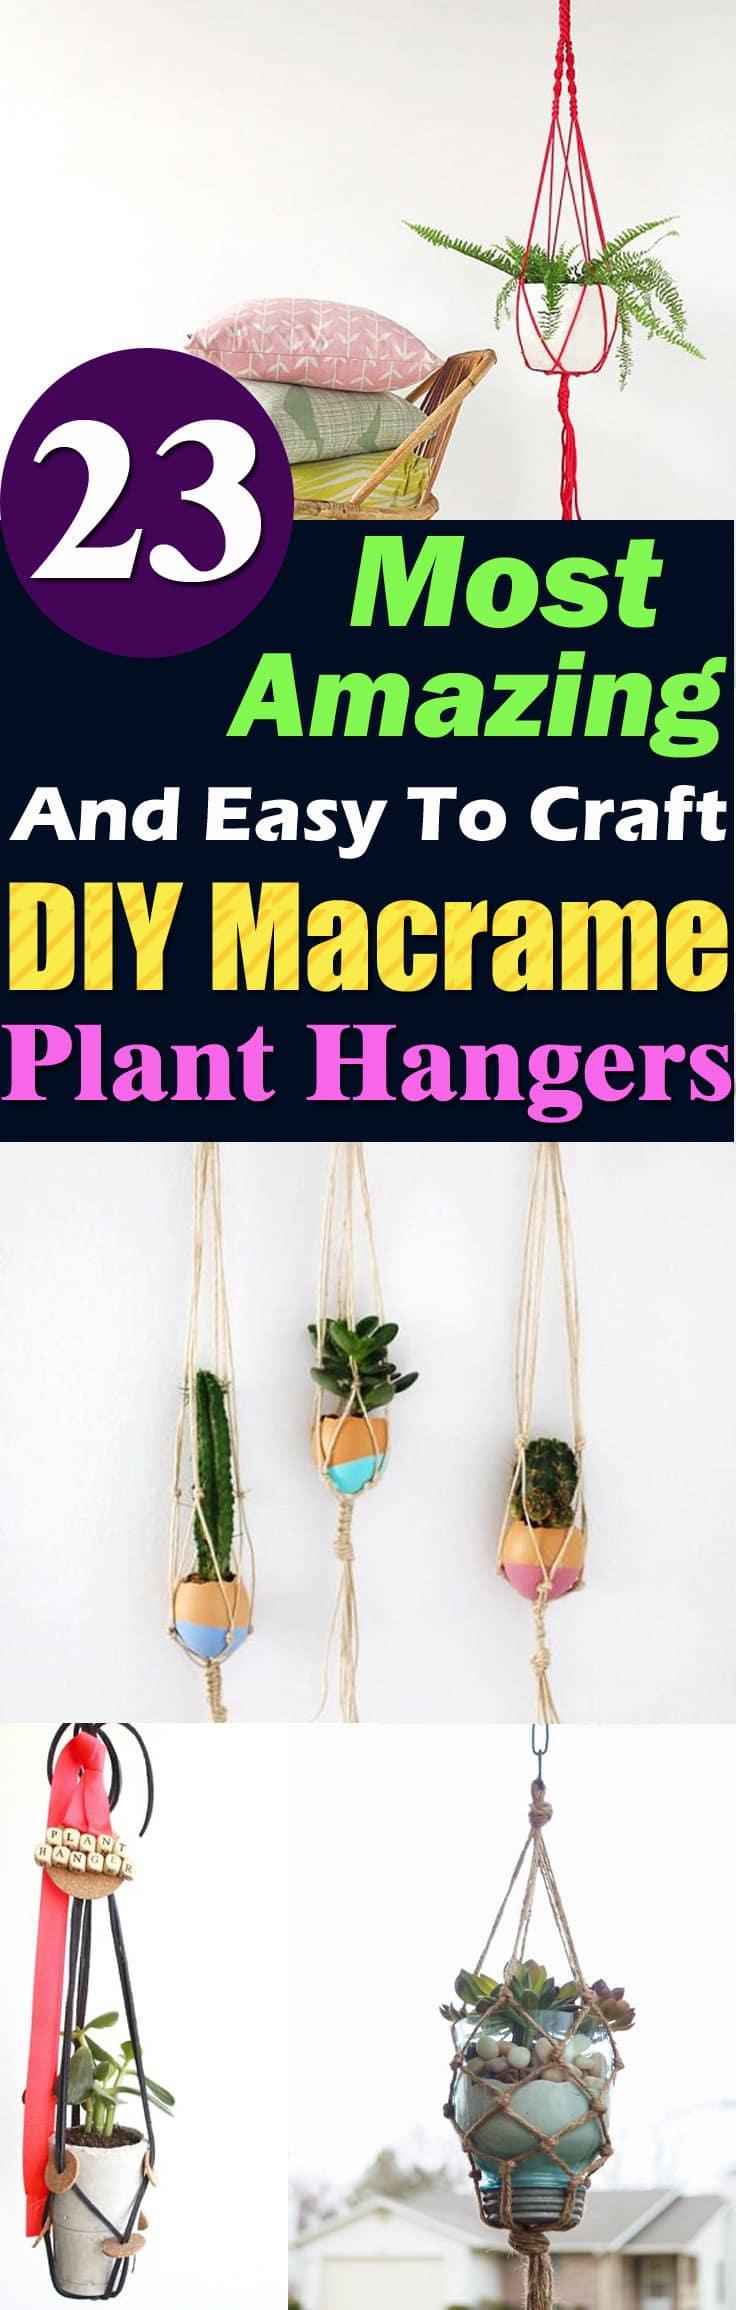 23 Most Amazing Macrame Plant Hangers Diy Ideas Balcony